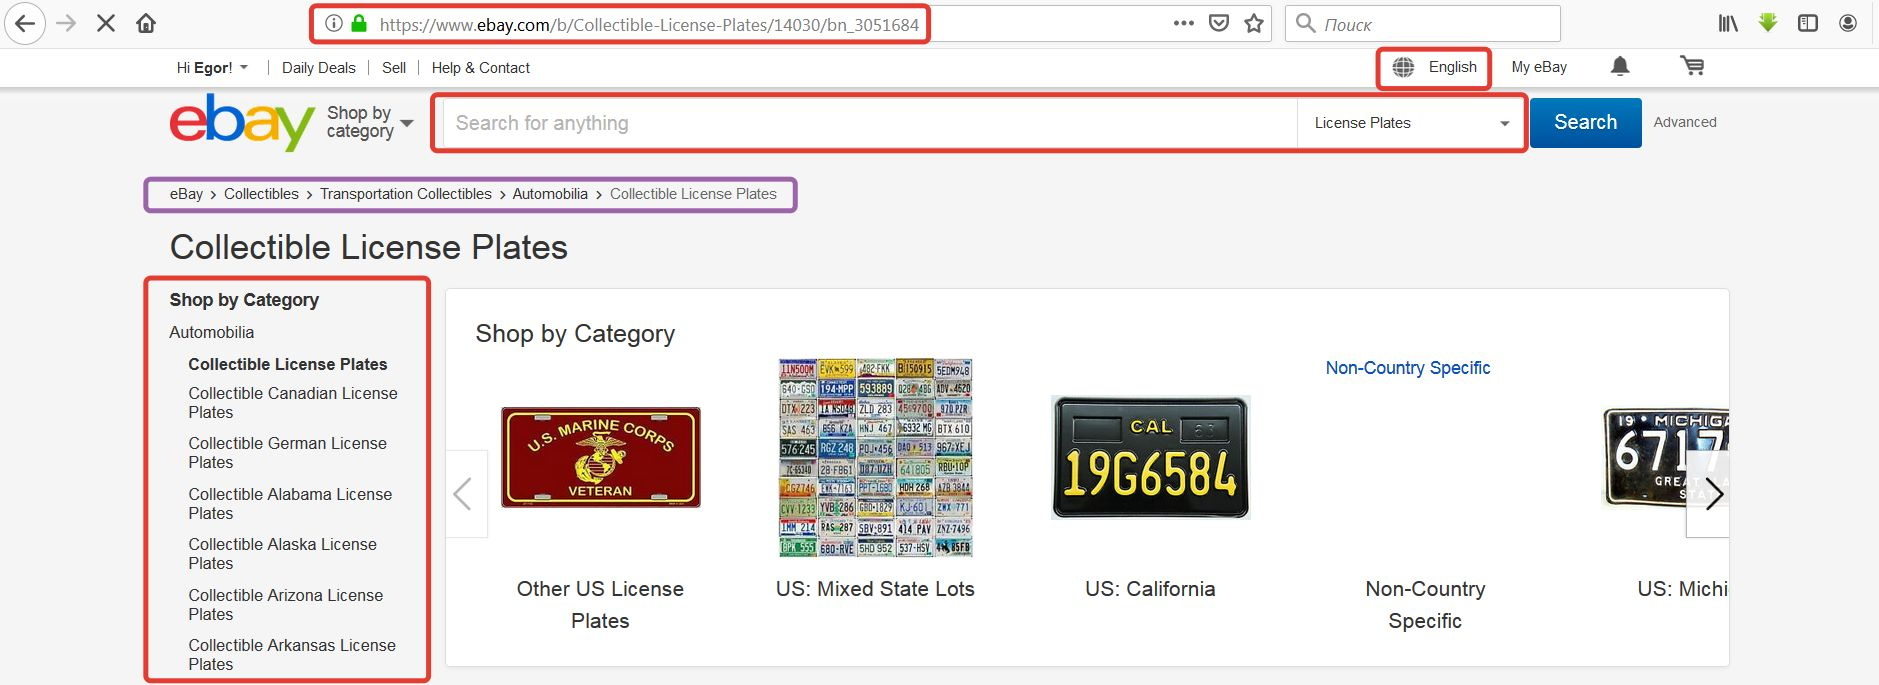 Интерфейс поиска на eBay